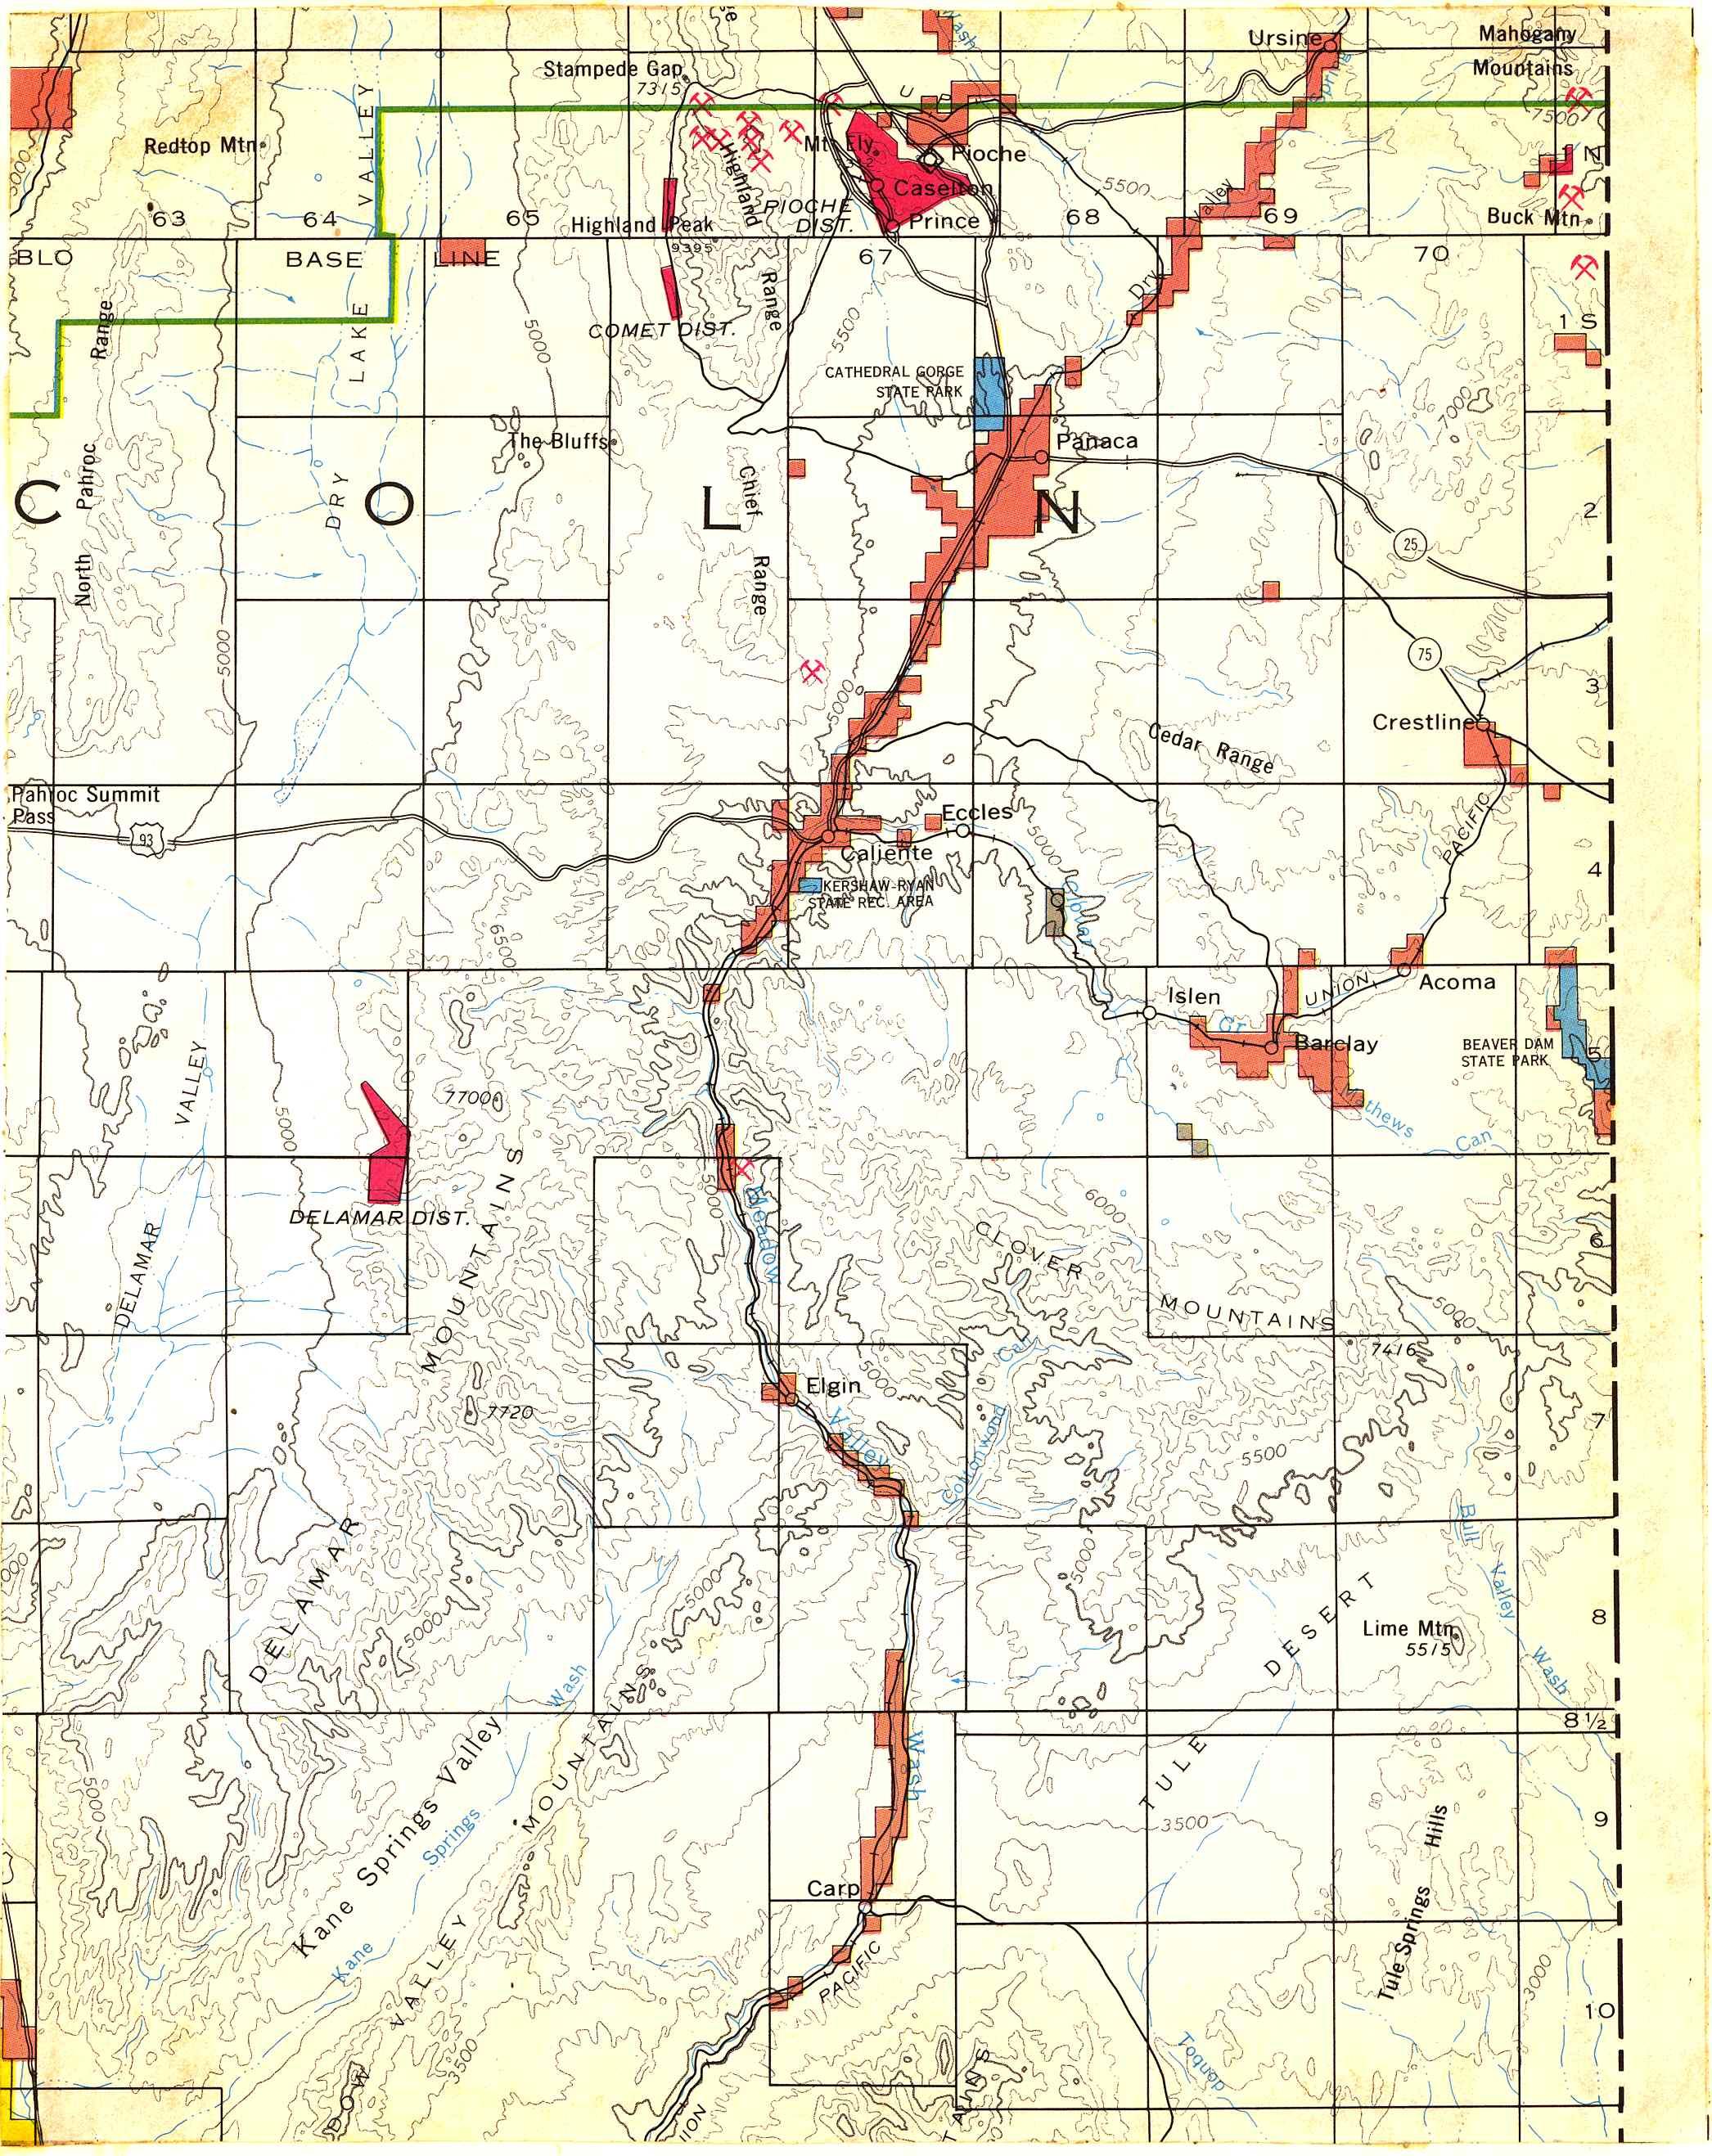 Map [2] 37:114 - Caliente - 1972